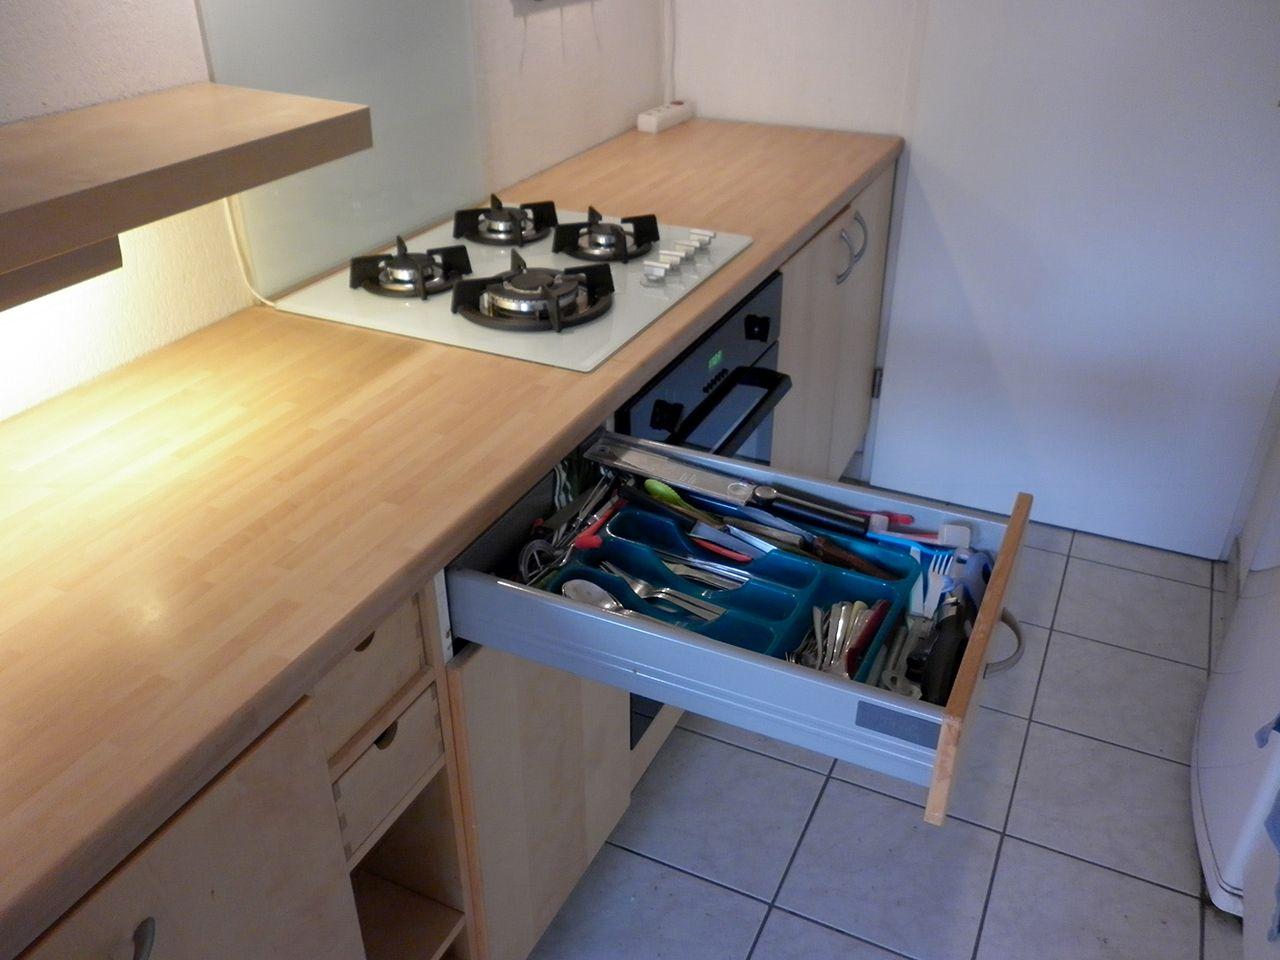 Vendu prix 250 cuisine ikea avec 5 l ments bas - Ikea cuisine range bouteille ...